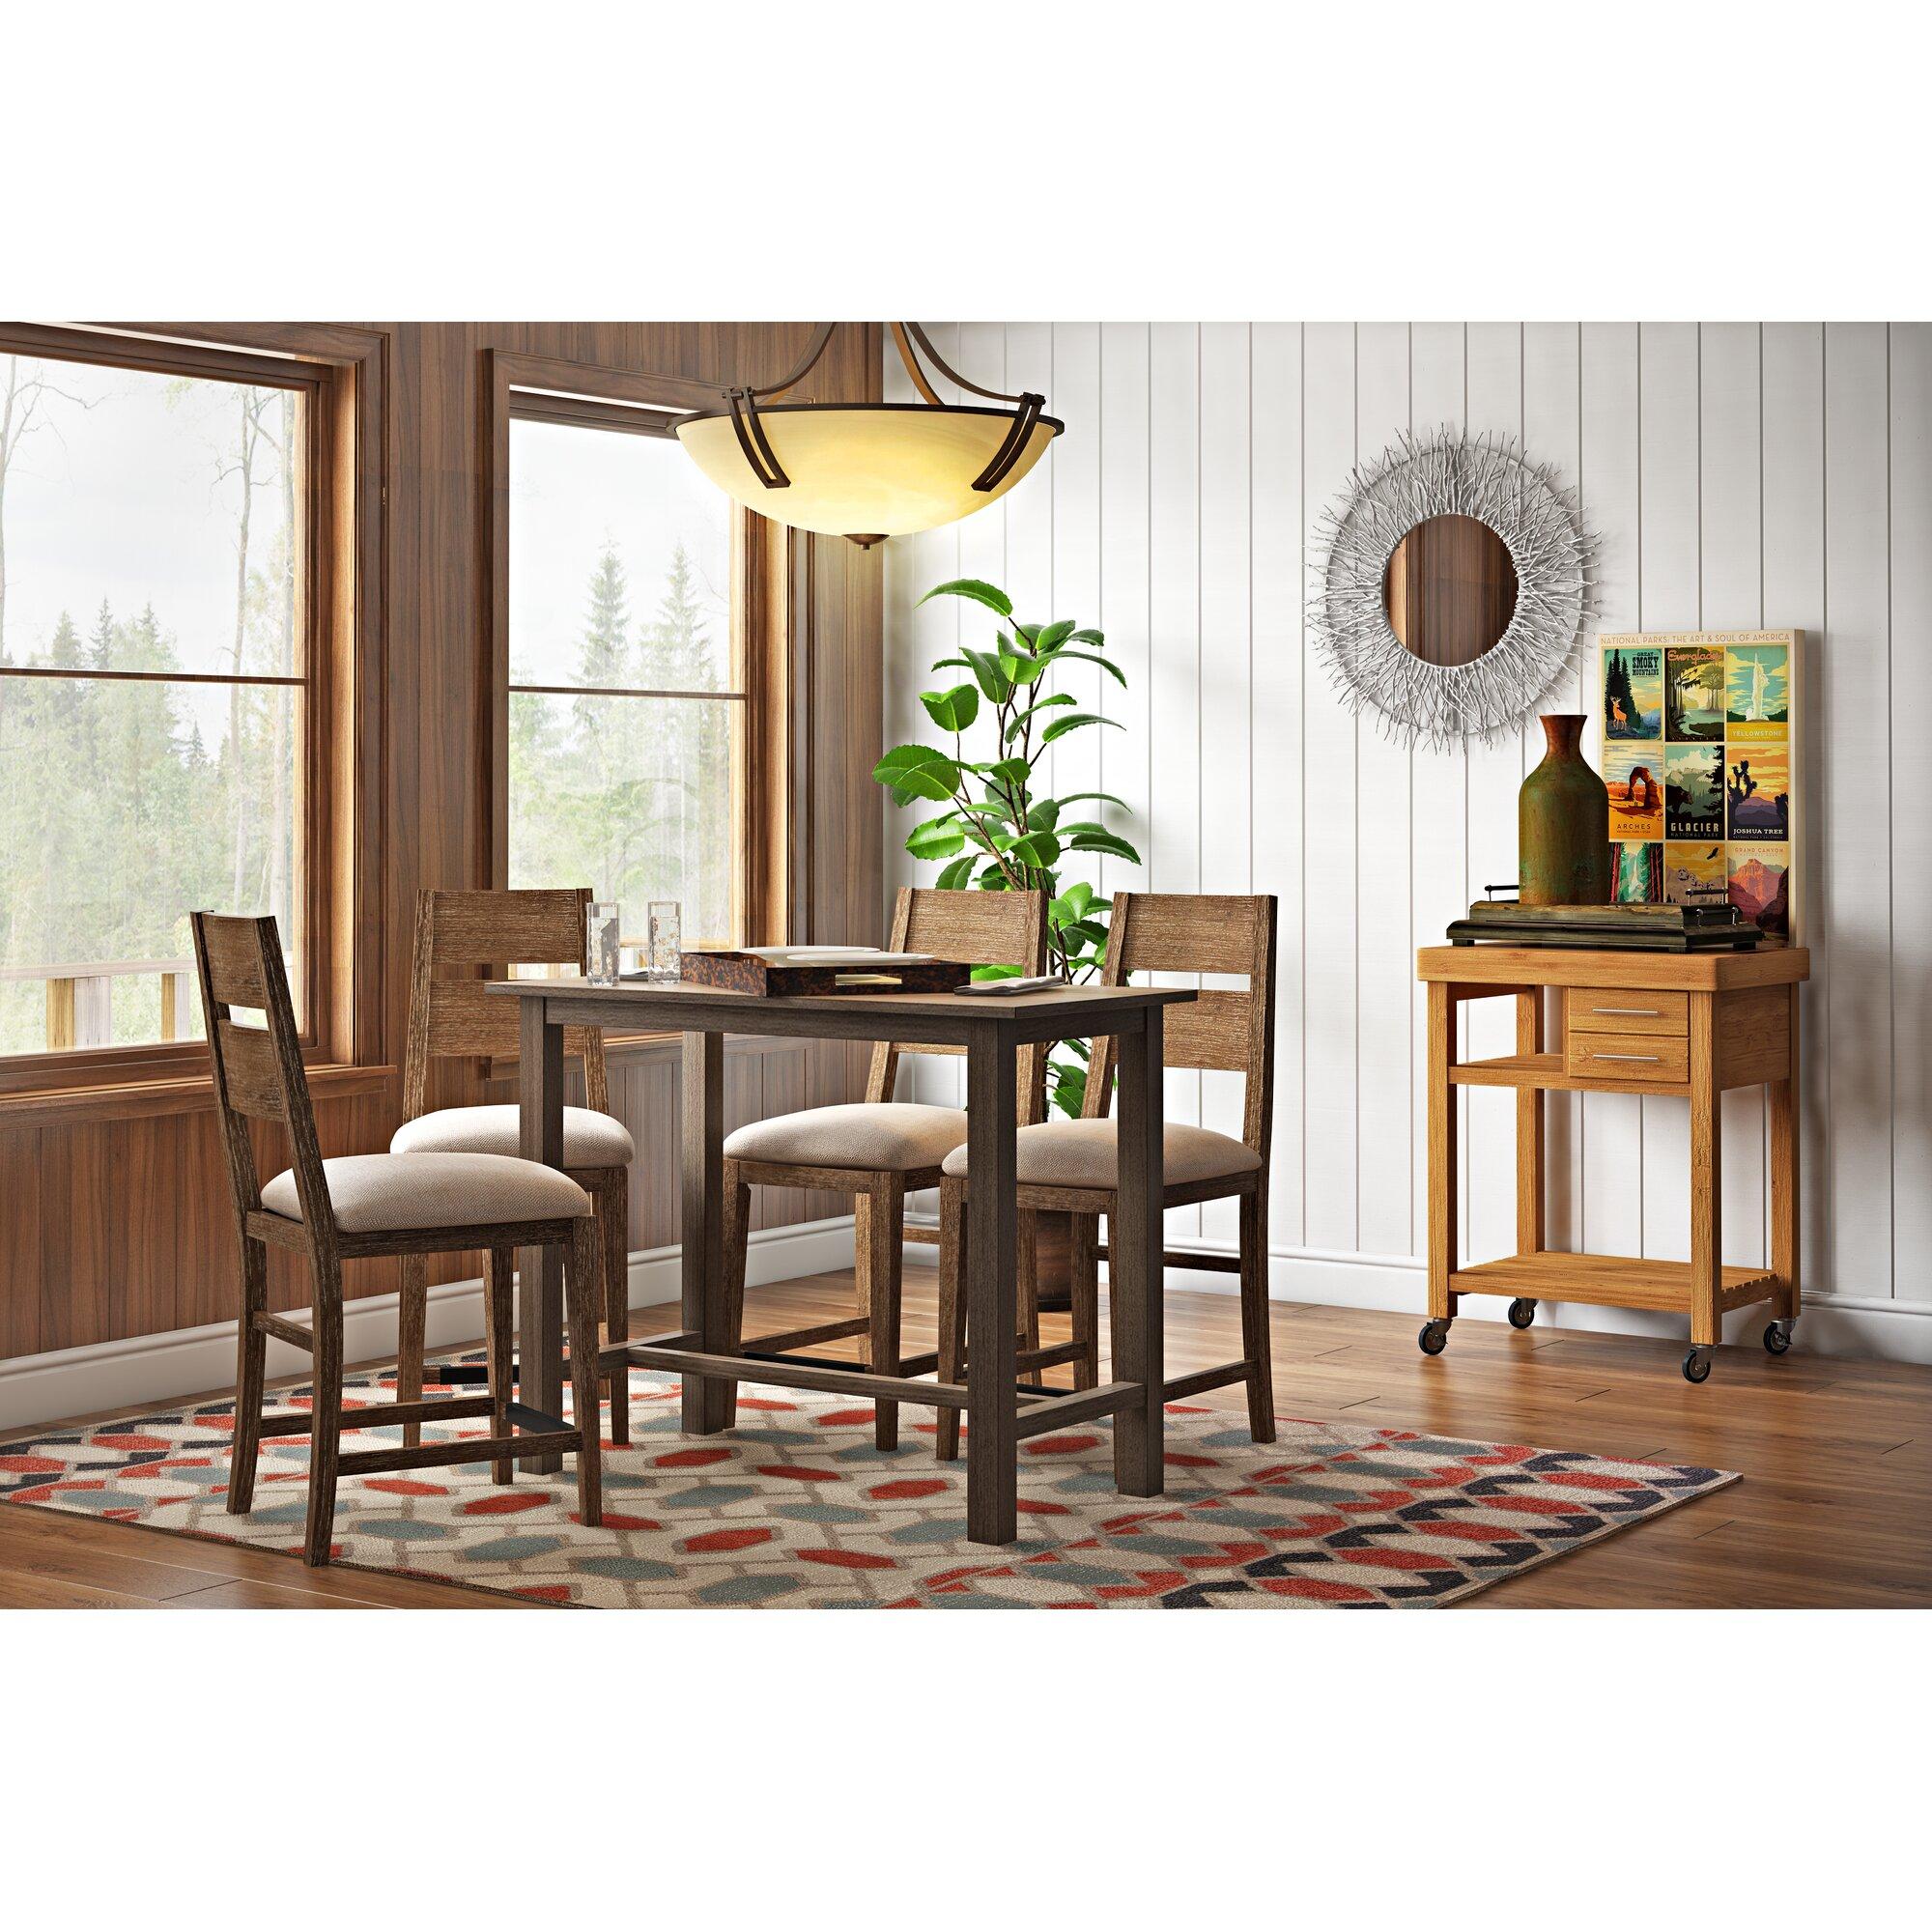 100 bamboo countertops granite countertop kitchen table con